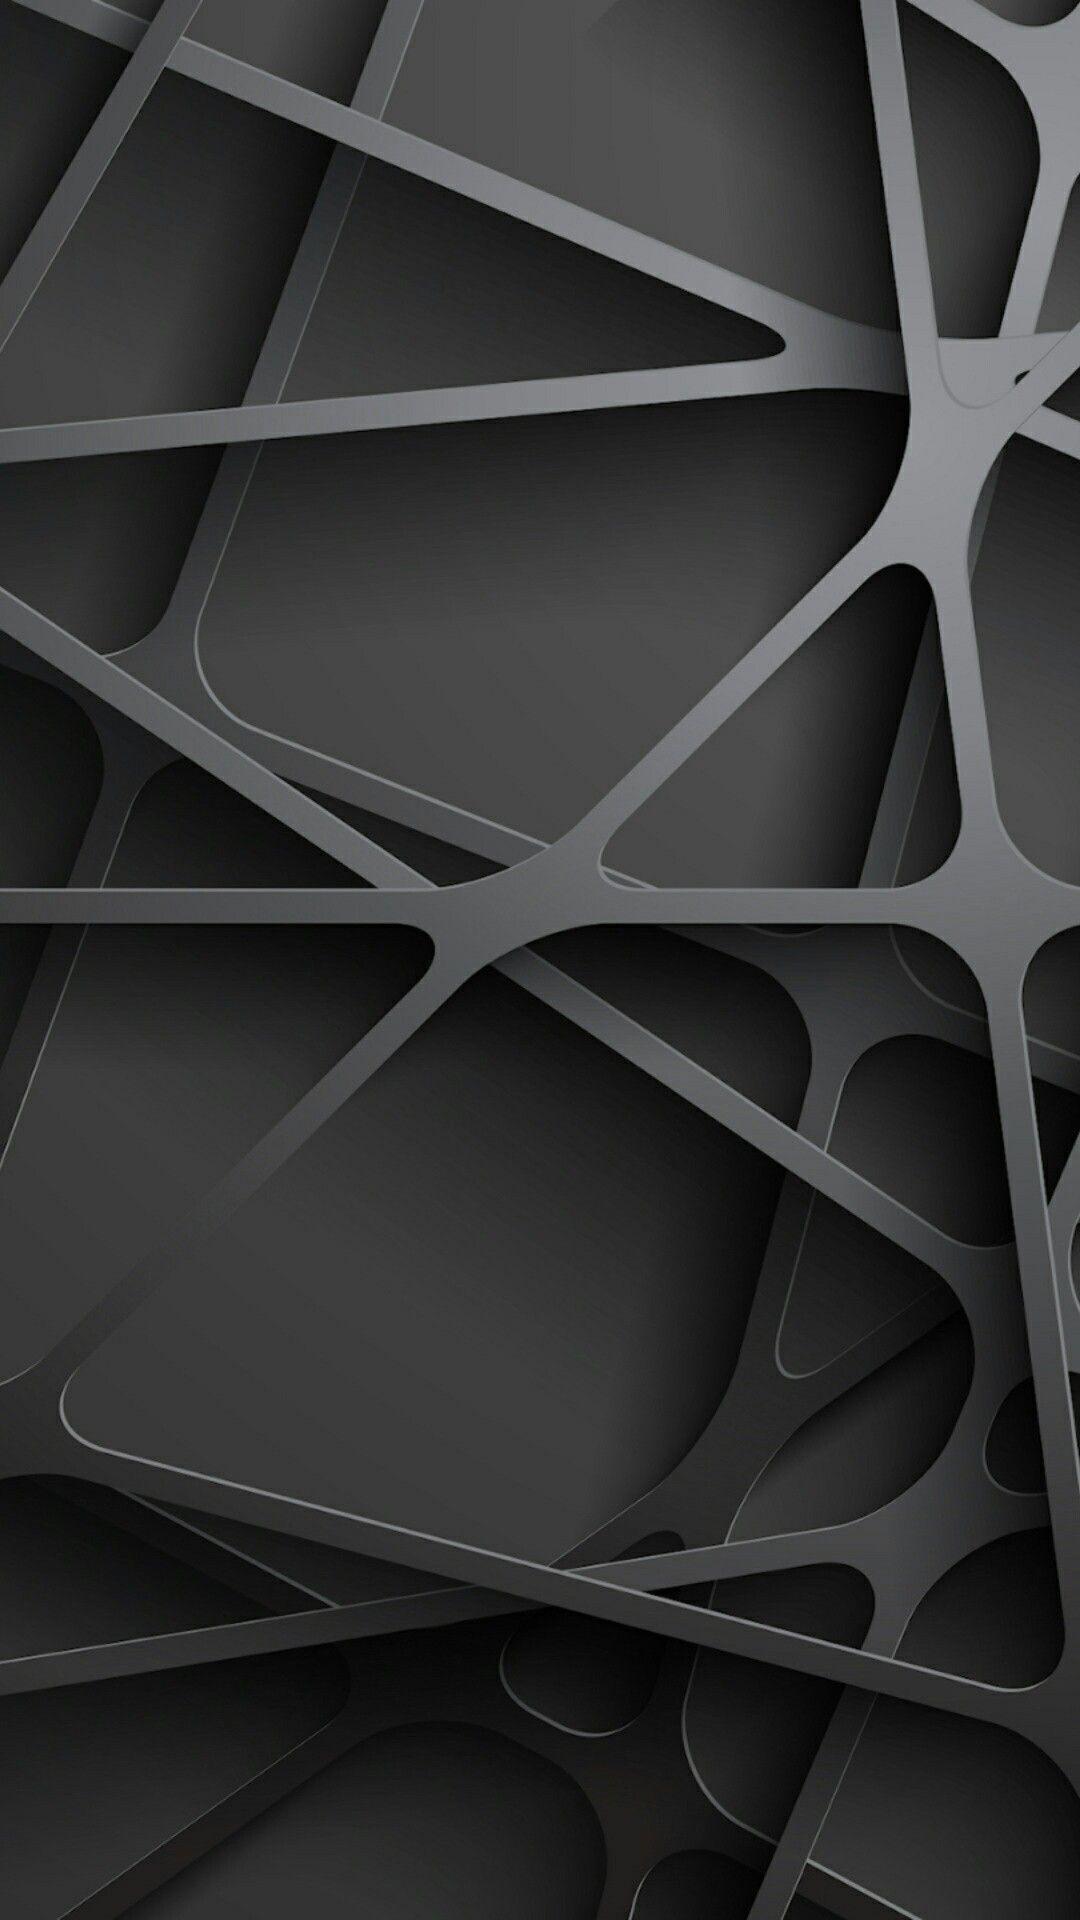 Black Geometric Wallpapers - Wallpaper Cave